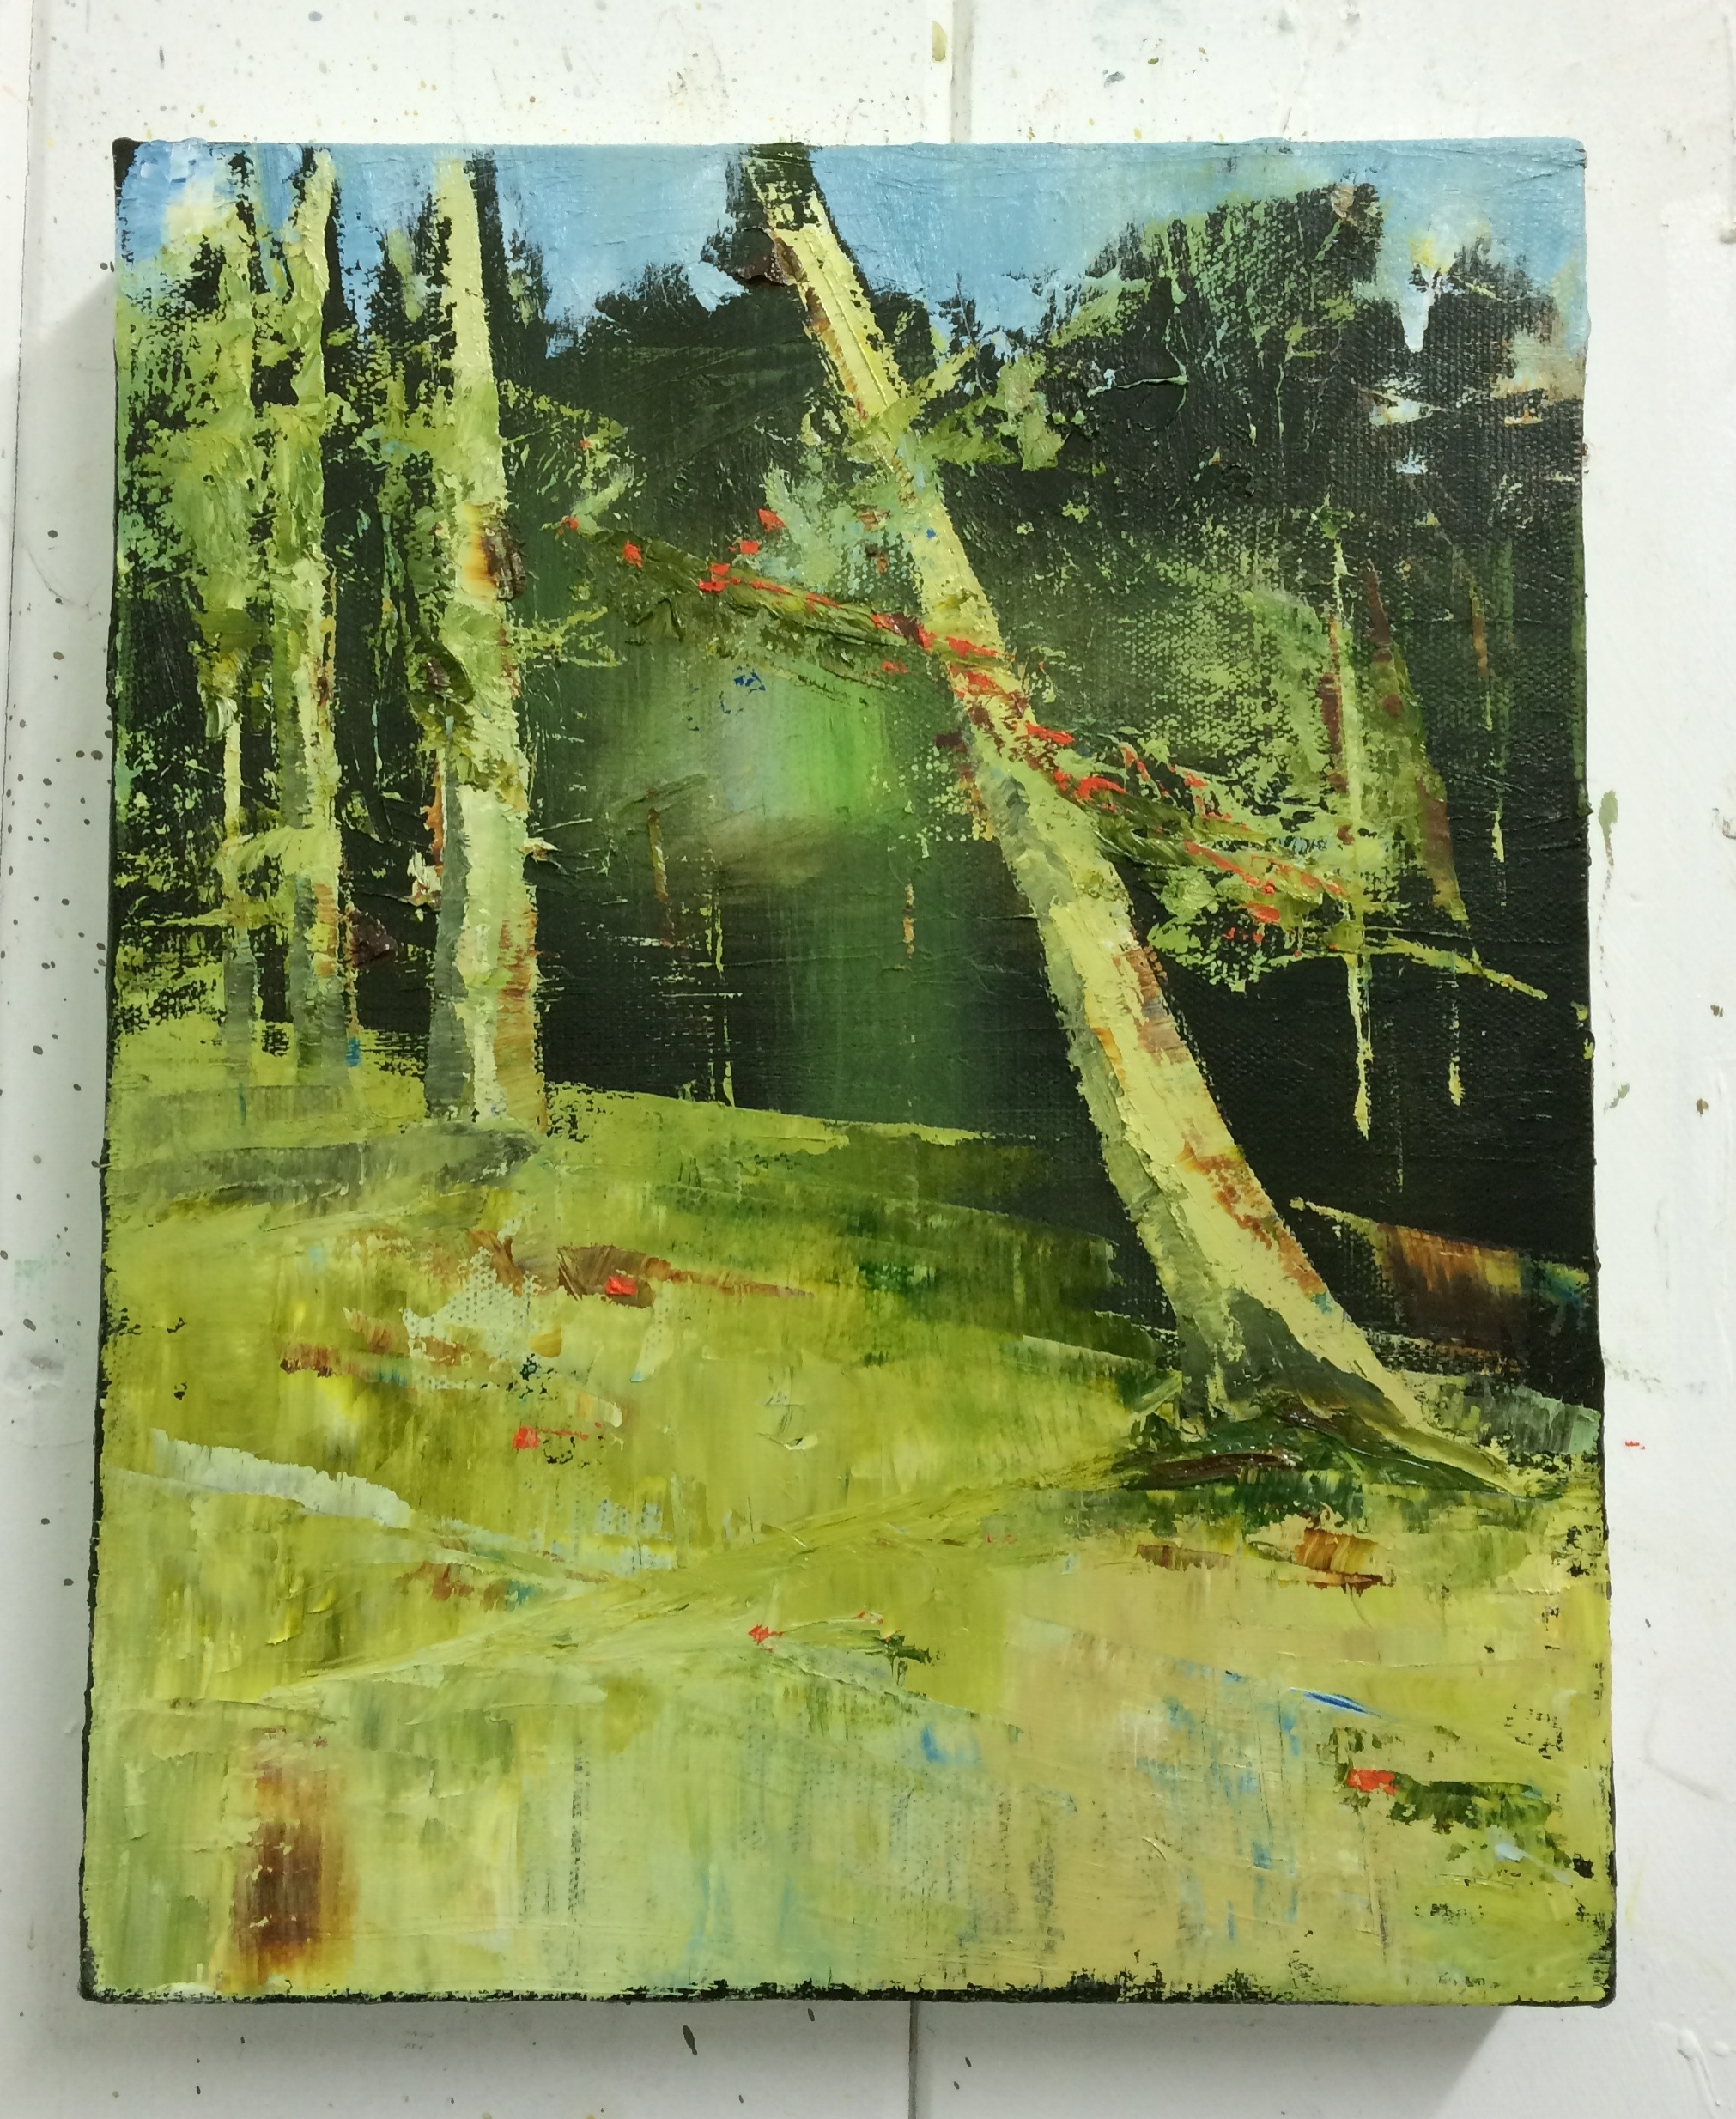 Lorraine Bewick - Glade  2016 30cm x 24cm Oil on Canvas